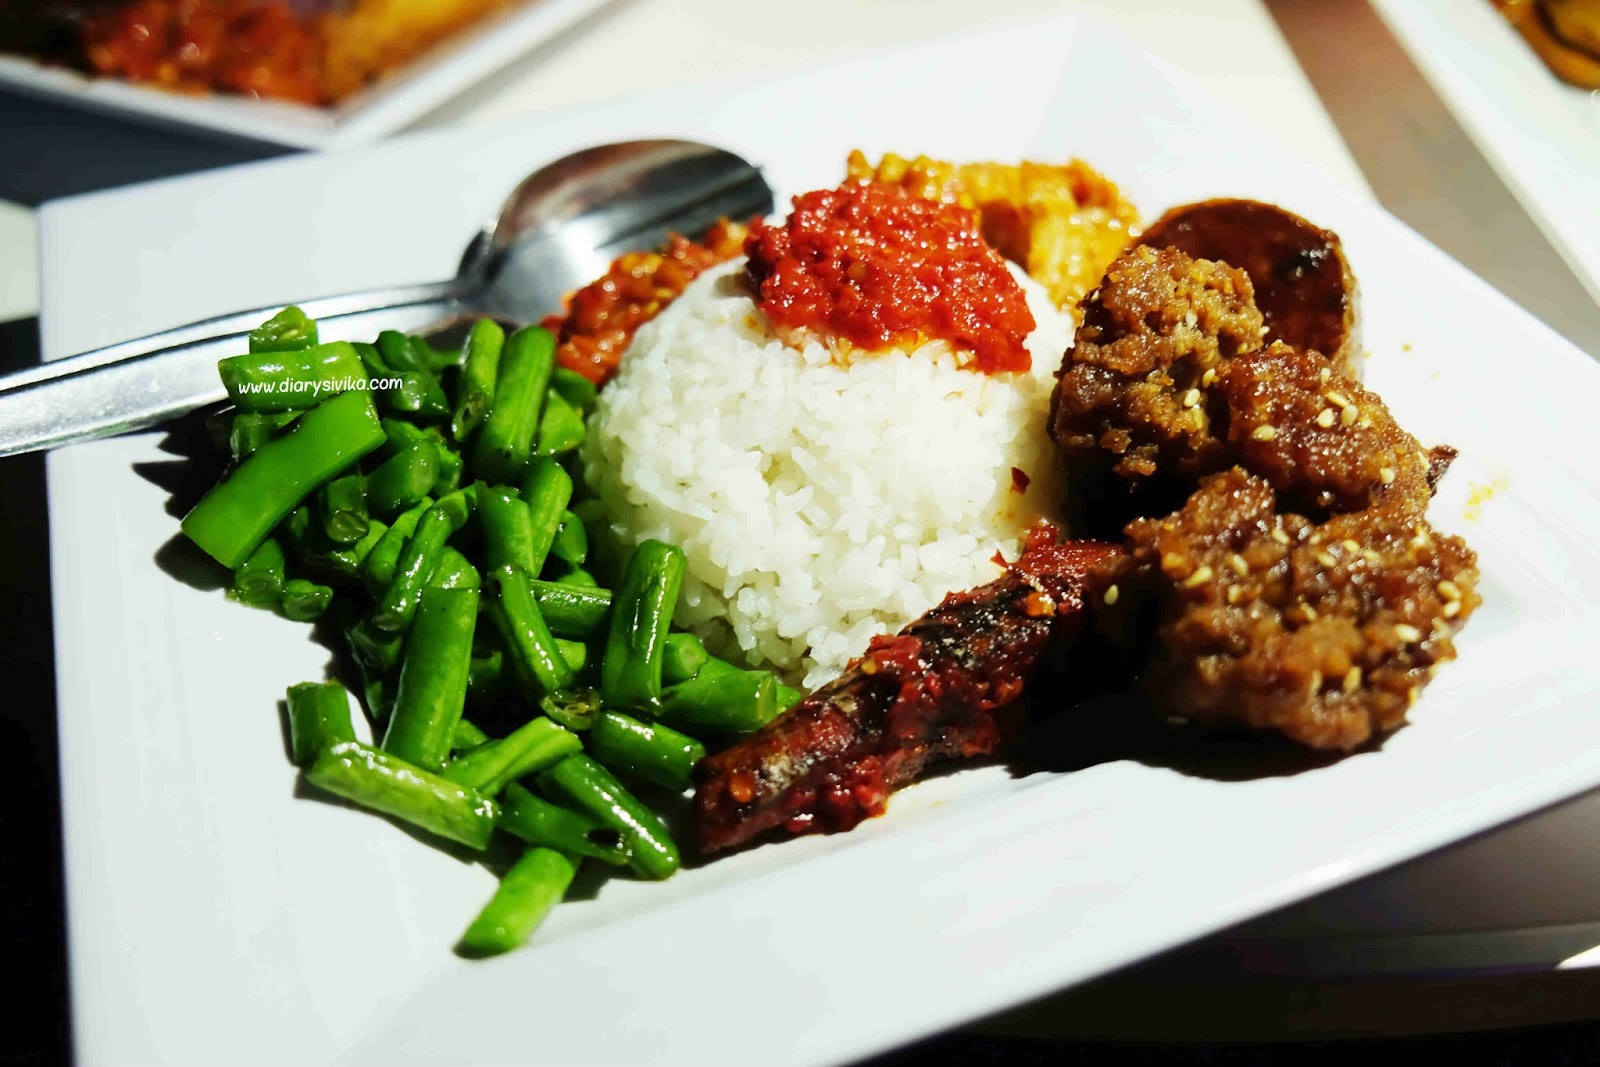 Diet Tetap makan Gorengan?… Ya Pakai Minyak Goreng Herco